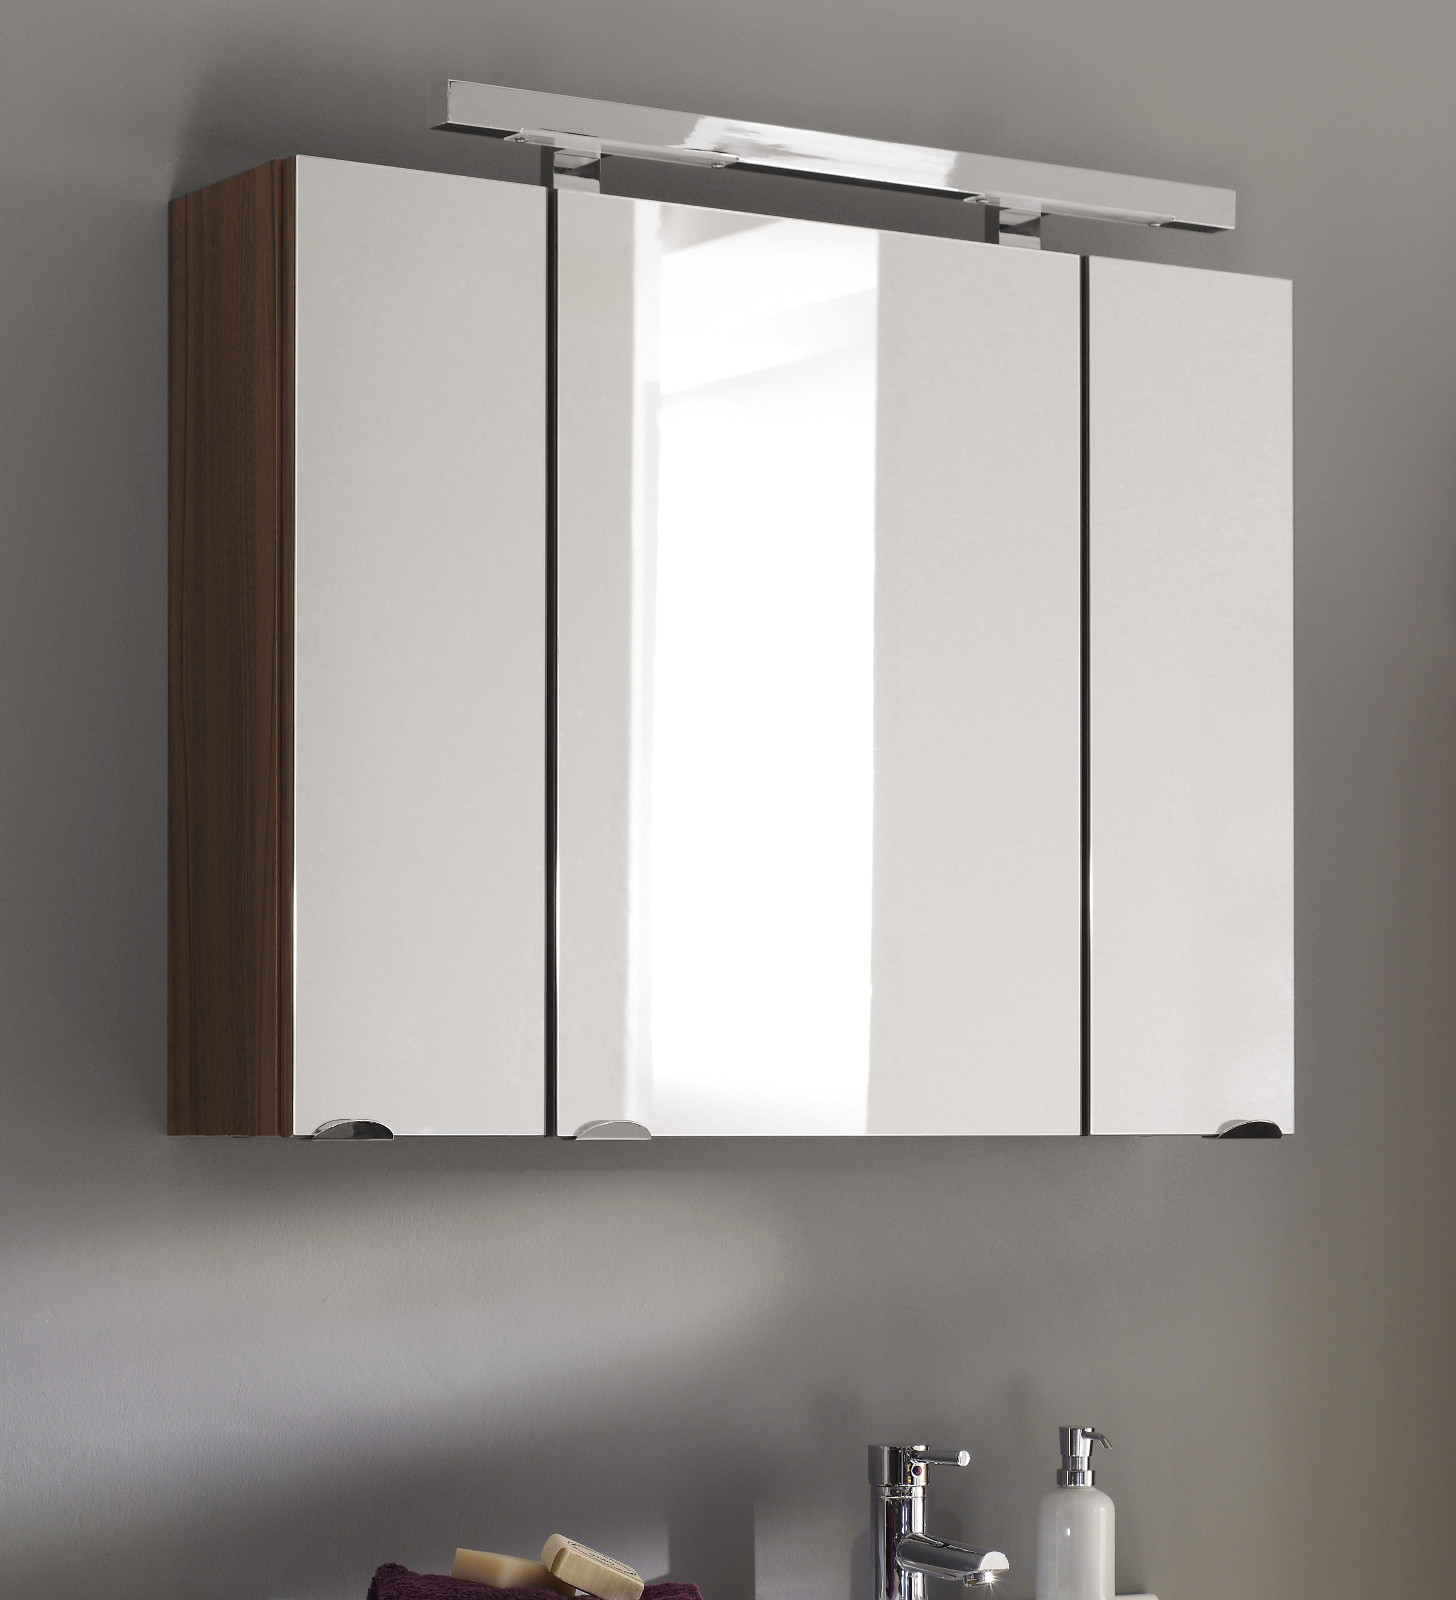 badm bel spiegelschrank laonda in walnuss. Black Bedroom Furniture Sets. Home Design Ideas